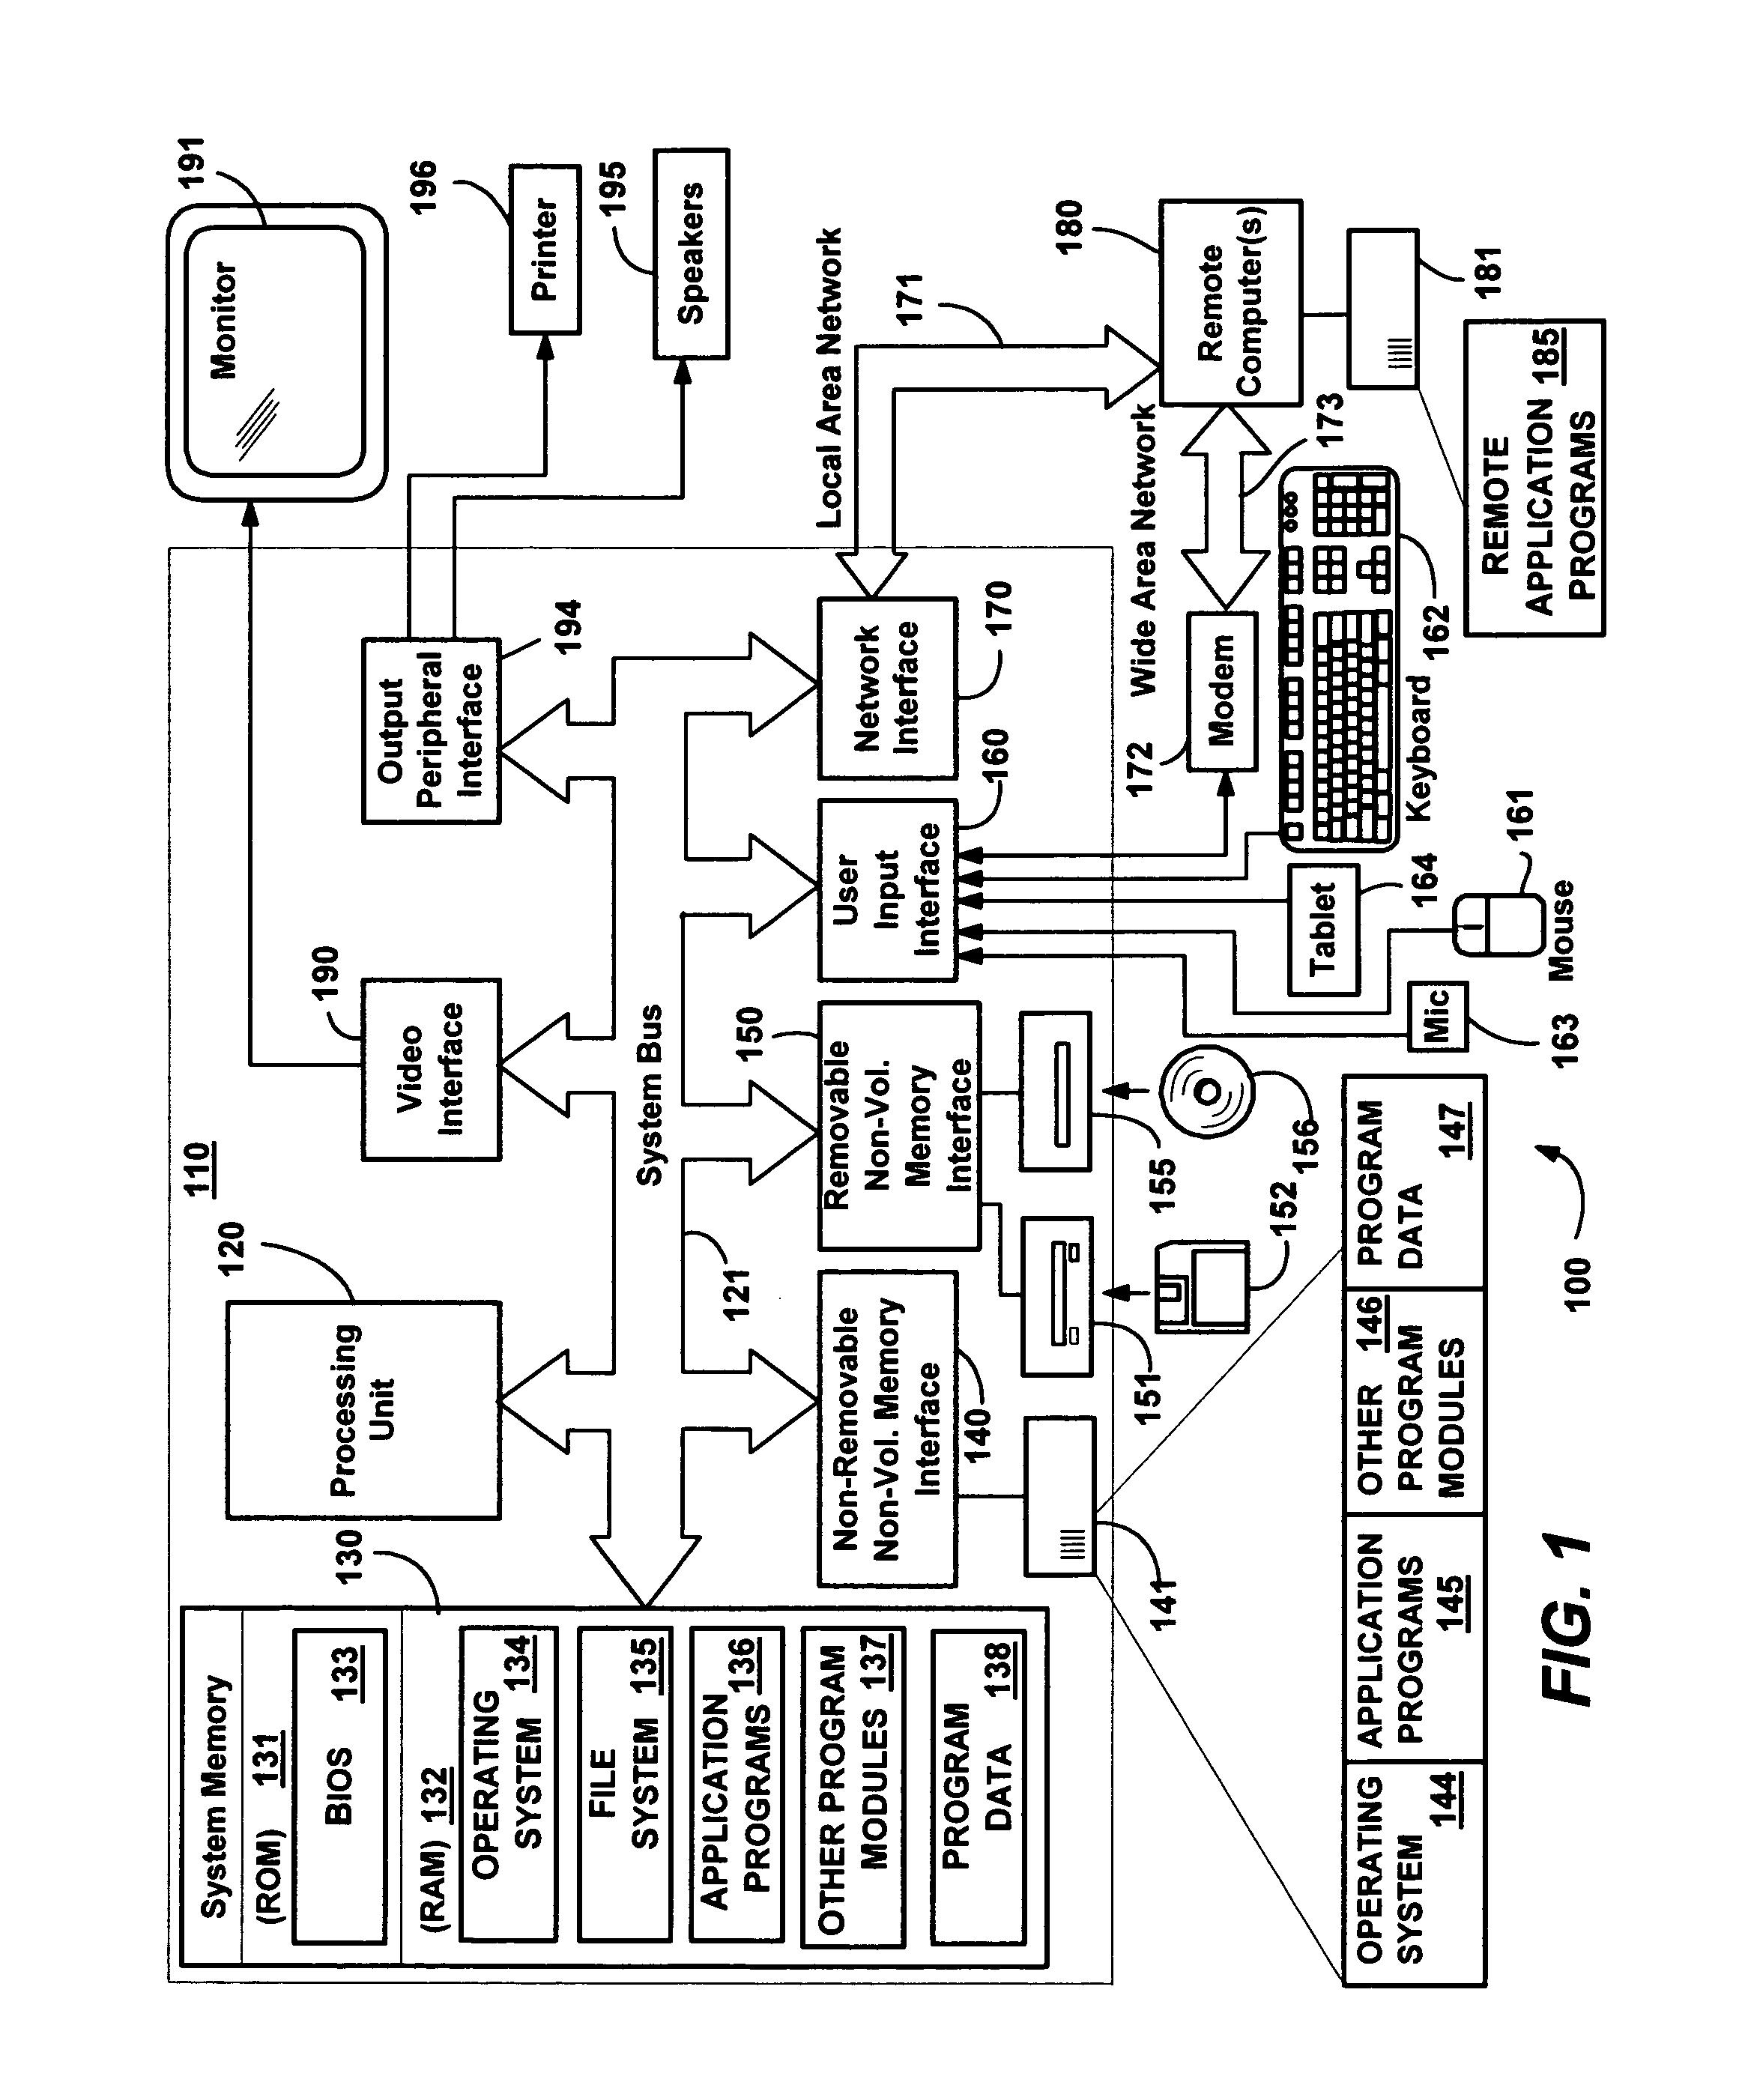 meta car alarm wiring diagram